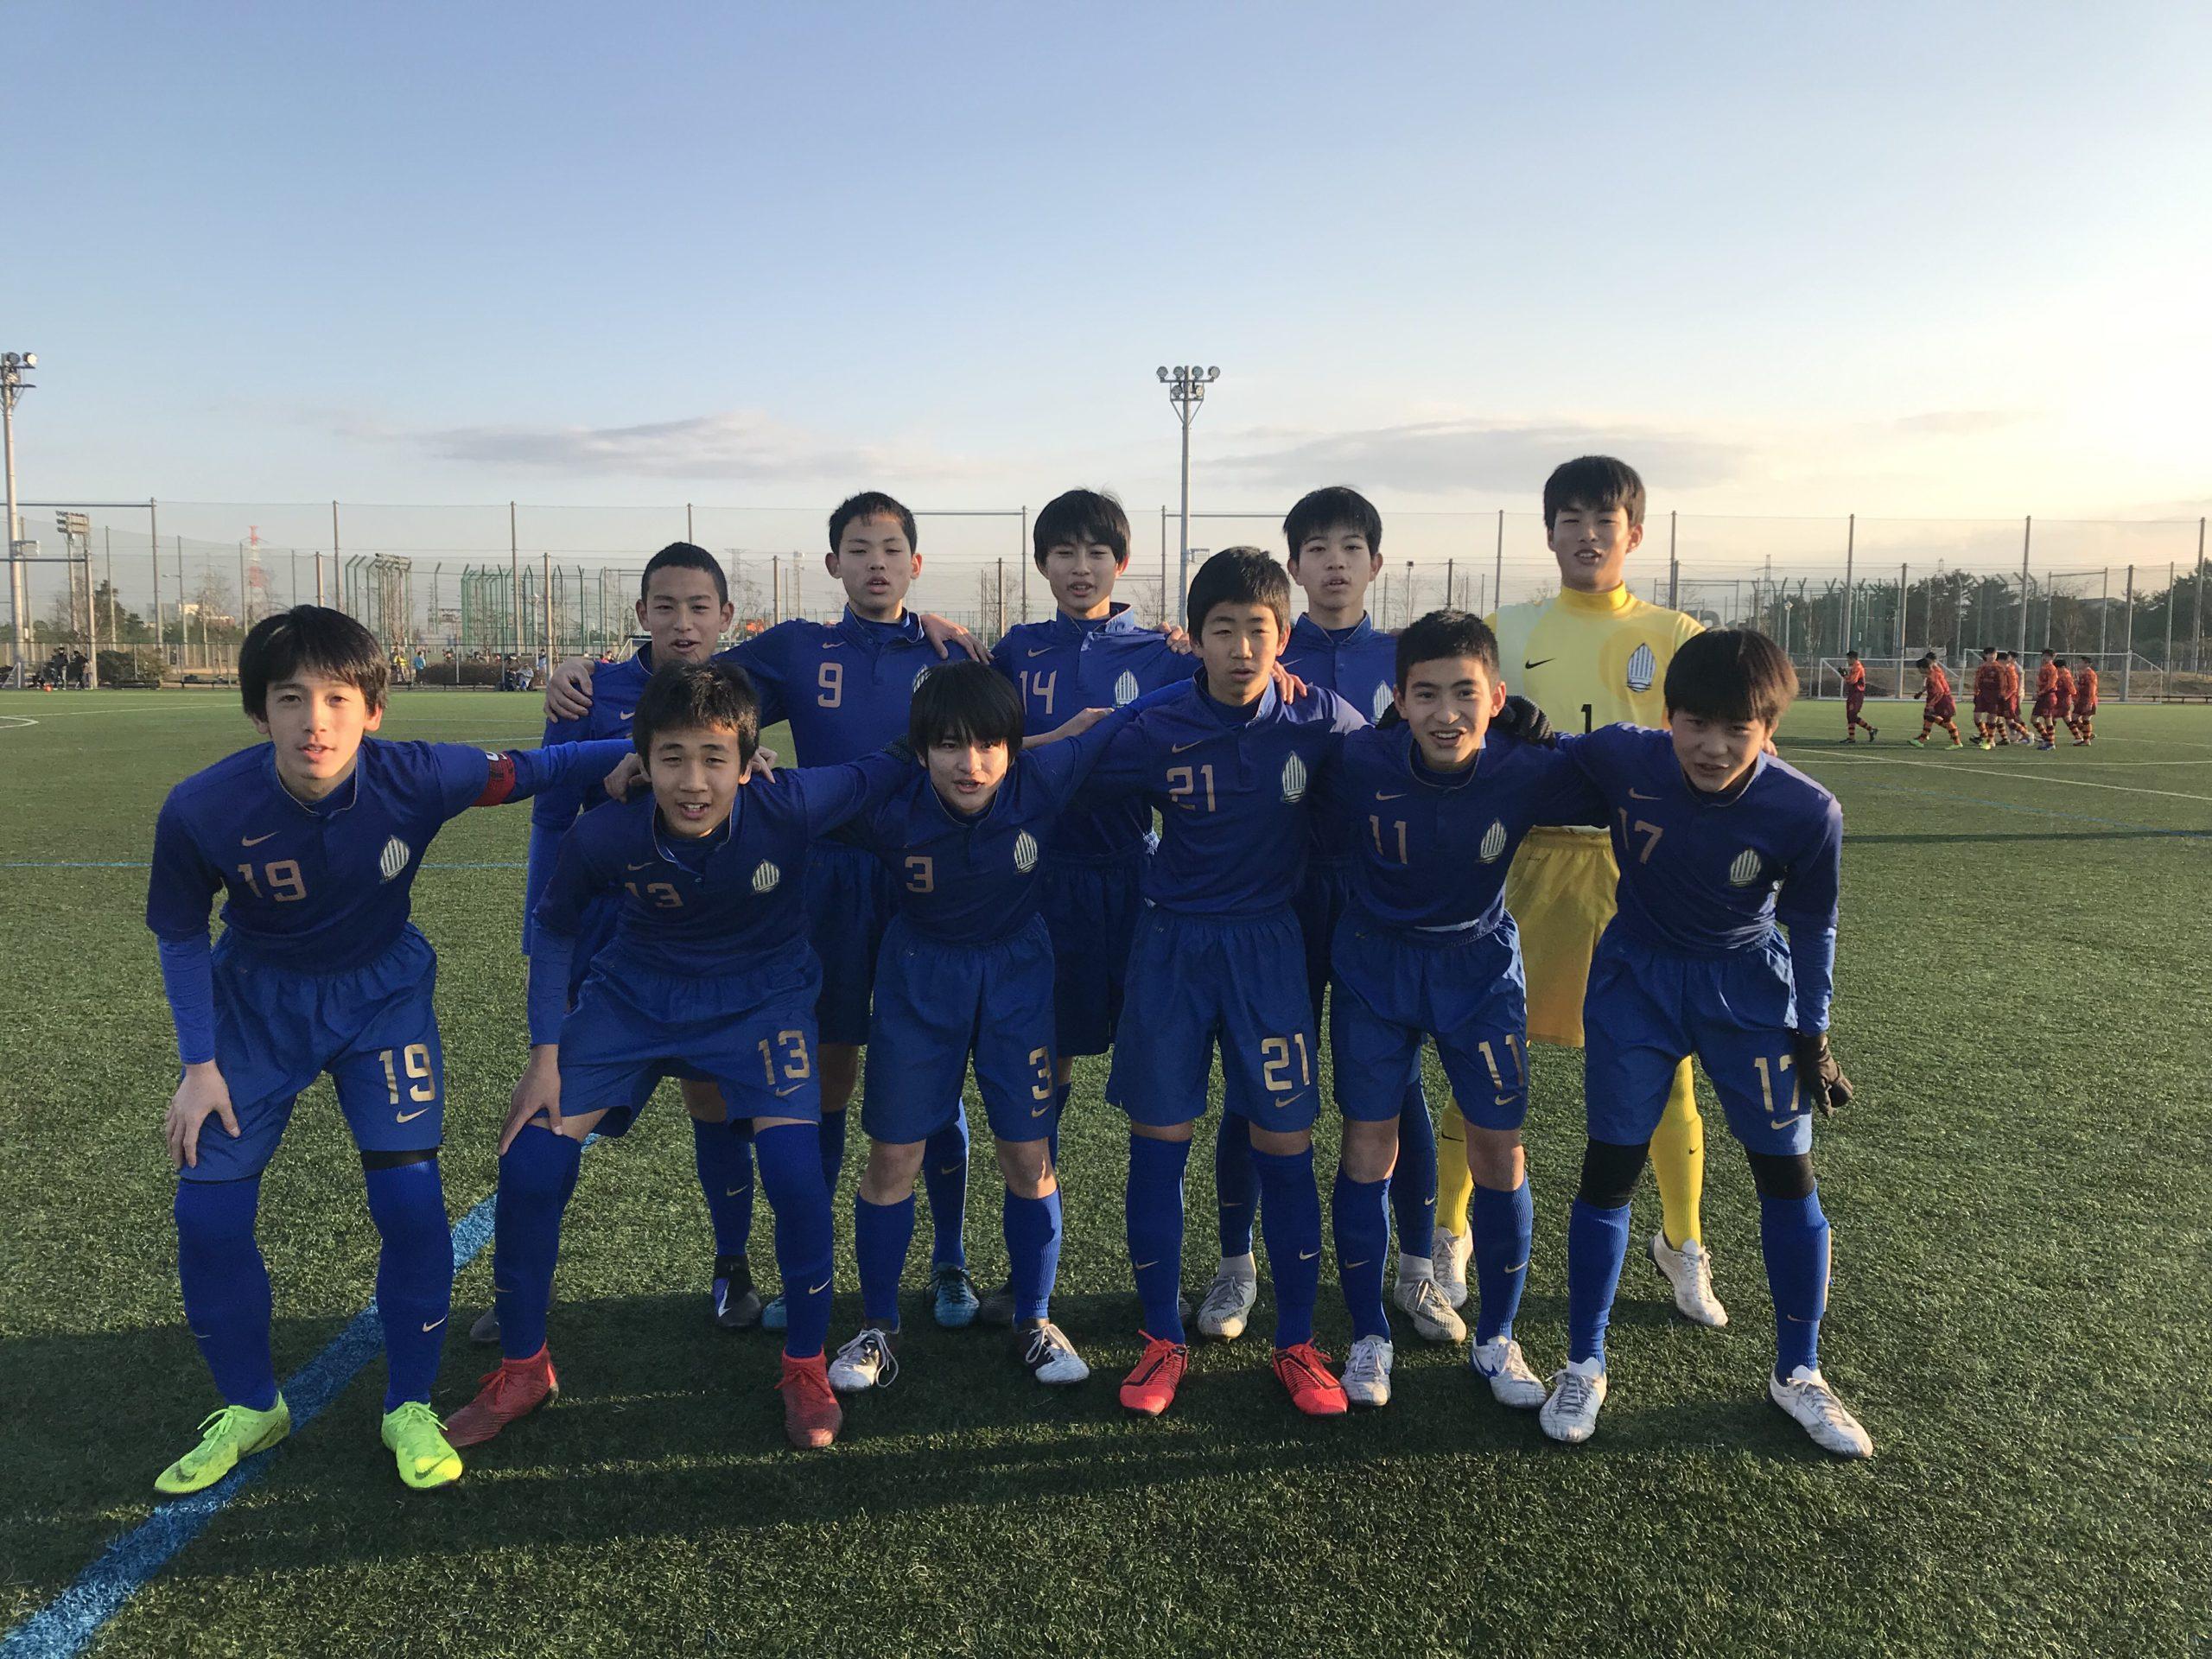 【U15】高円宮杯 U-15サッカー千葉県1部リーグ 第5節